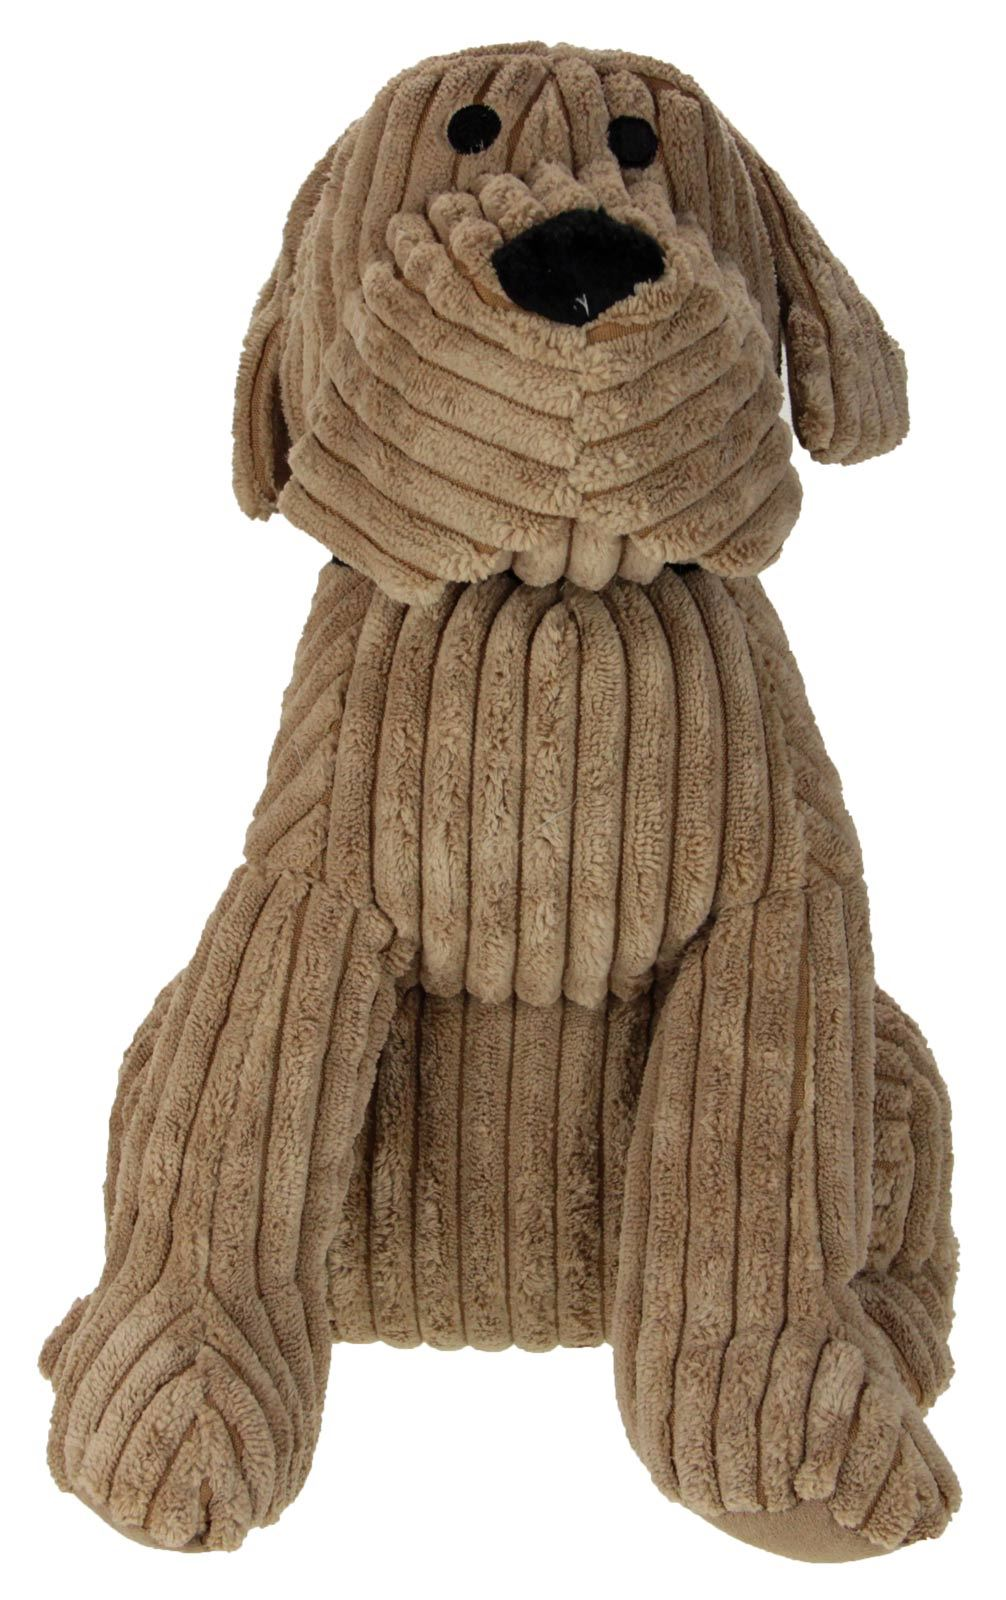 Cute puppy doggy door stop luxury heavy duty stopper tan grey brown ebay - Cute door stoppers ...